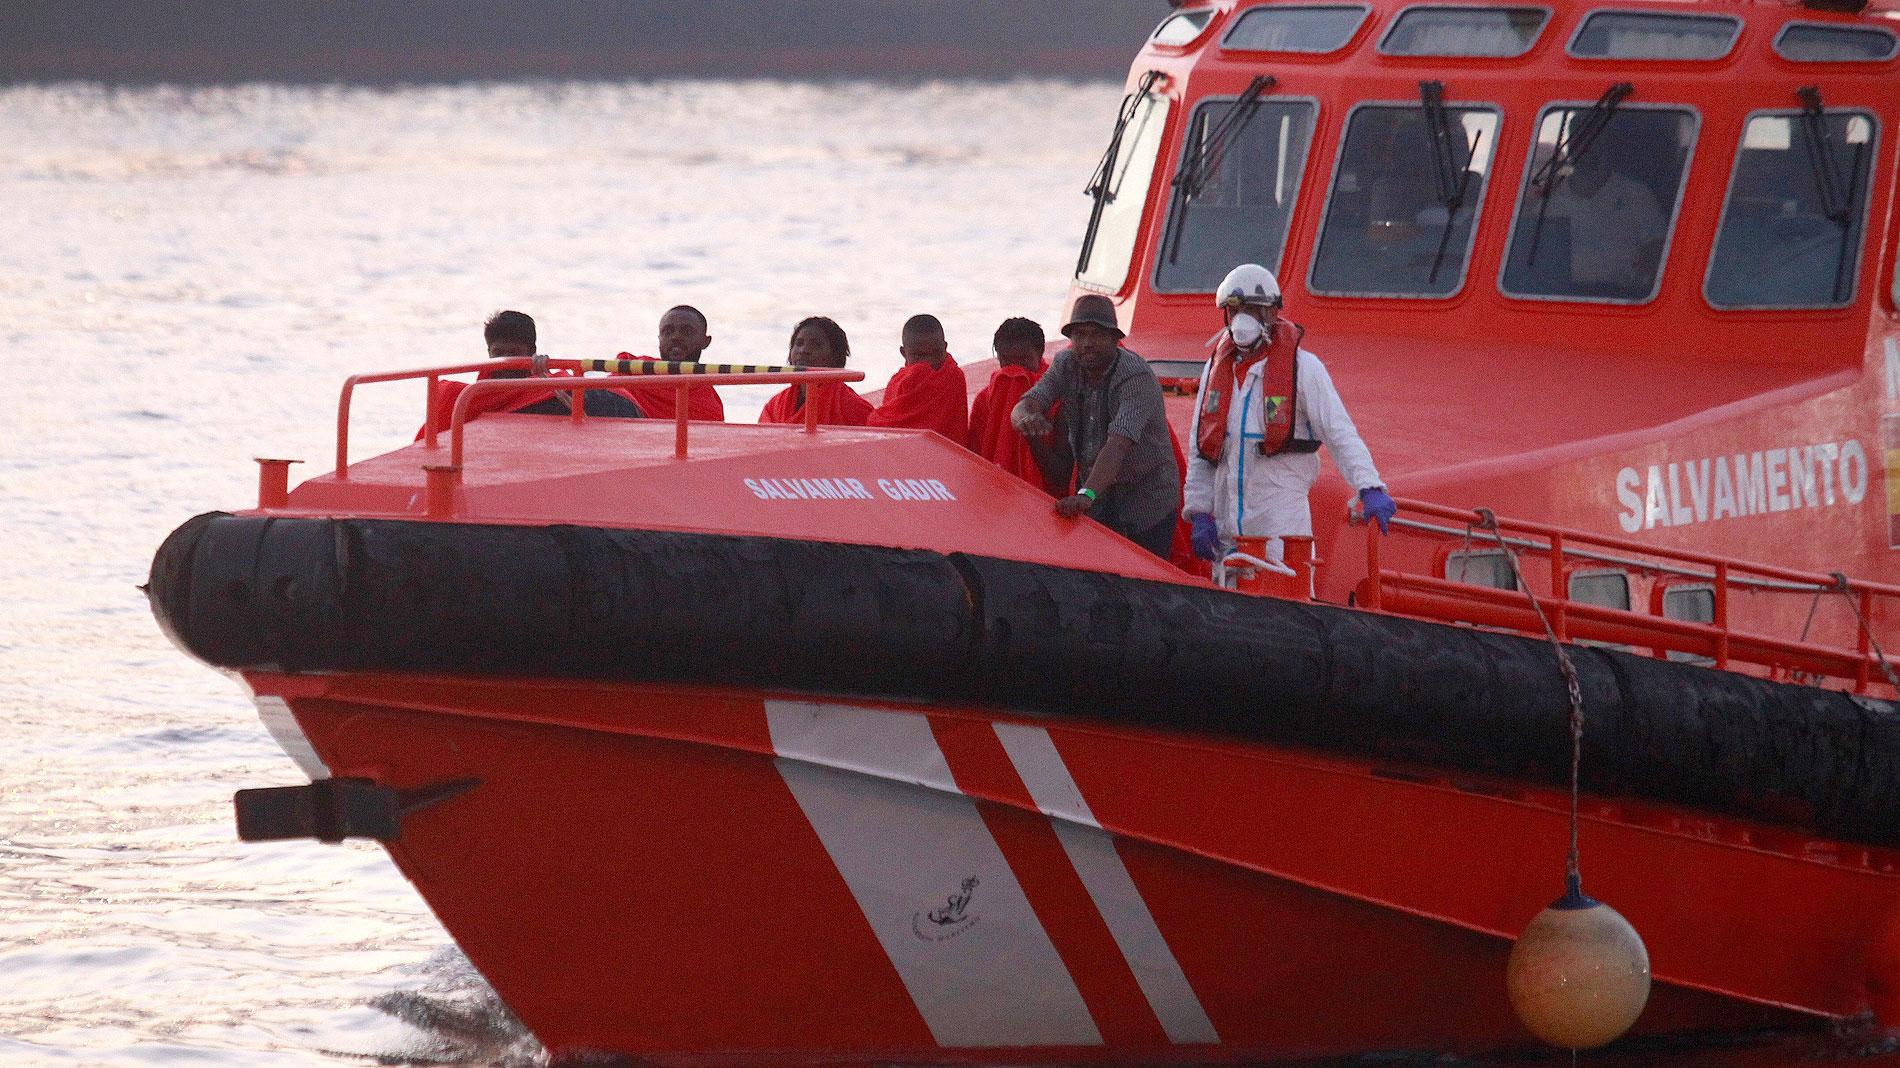 Ir al VideoSalvamento Marítimo rescata a casi 400 personas que viajaban en pateras